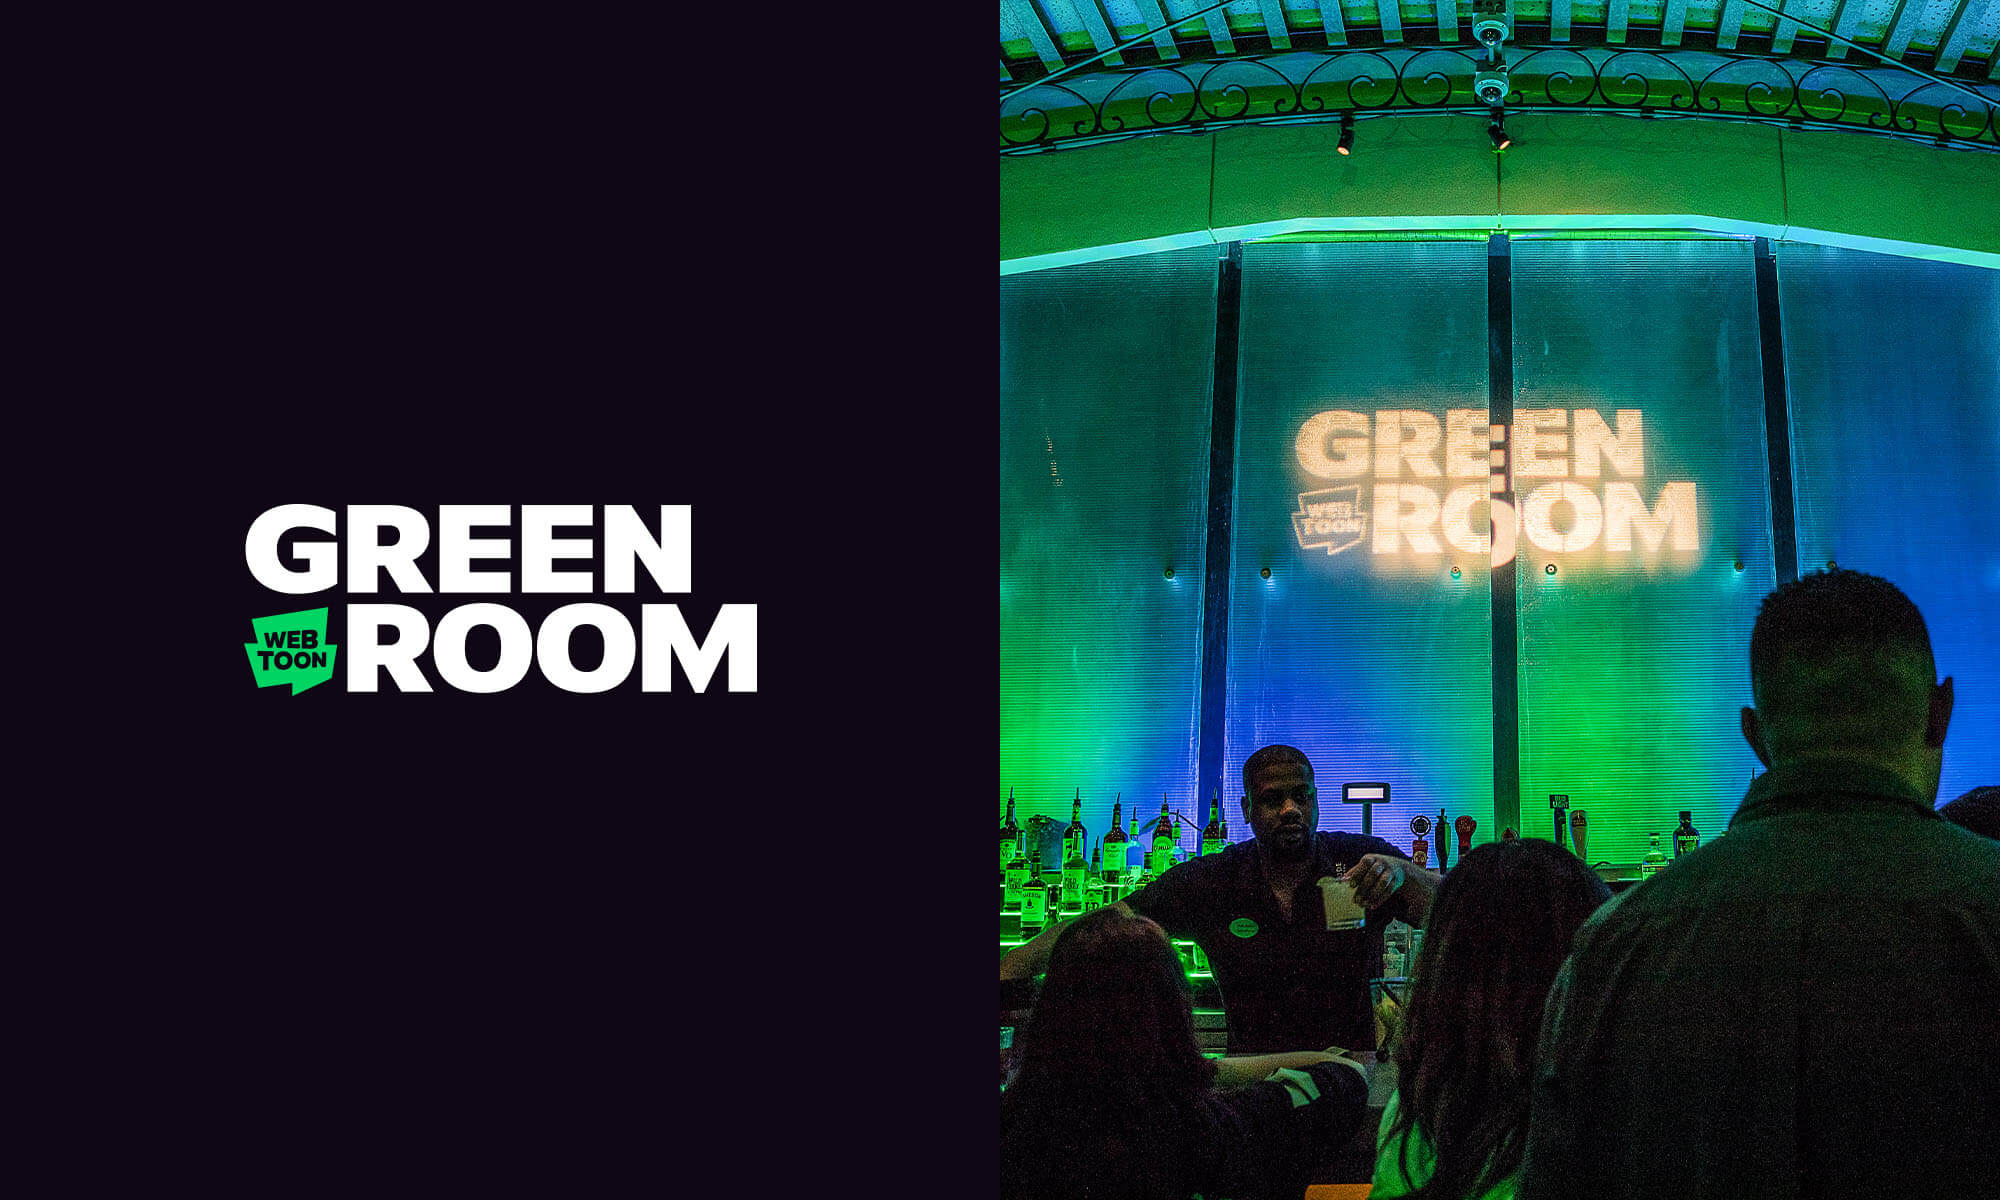 studio-malagon-green-room-brand-01